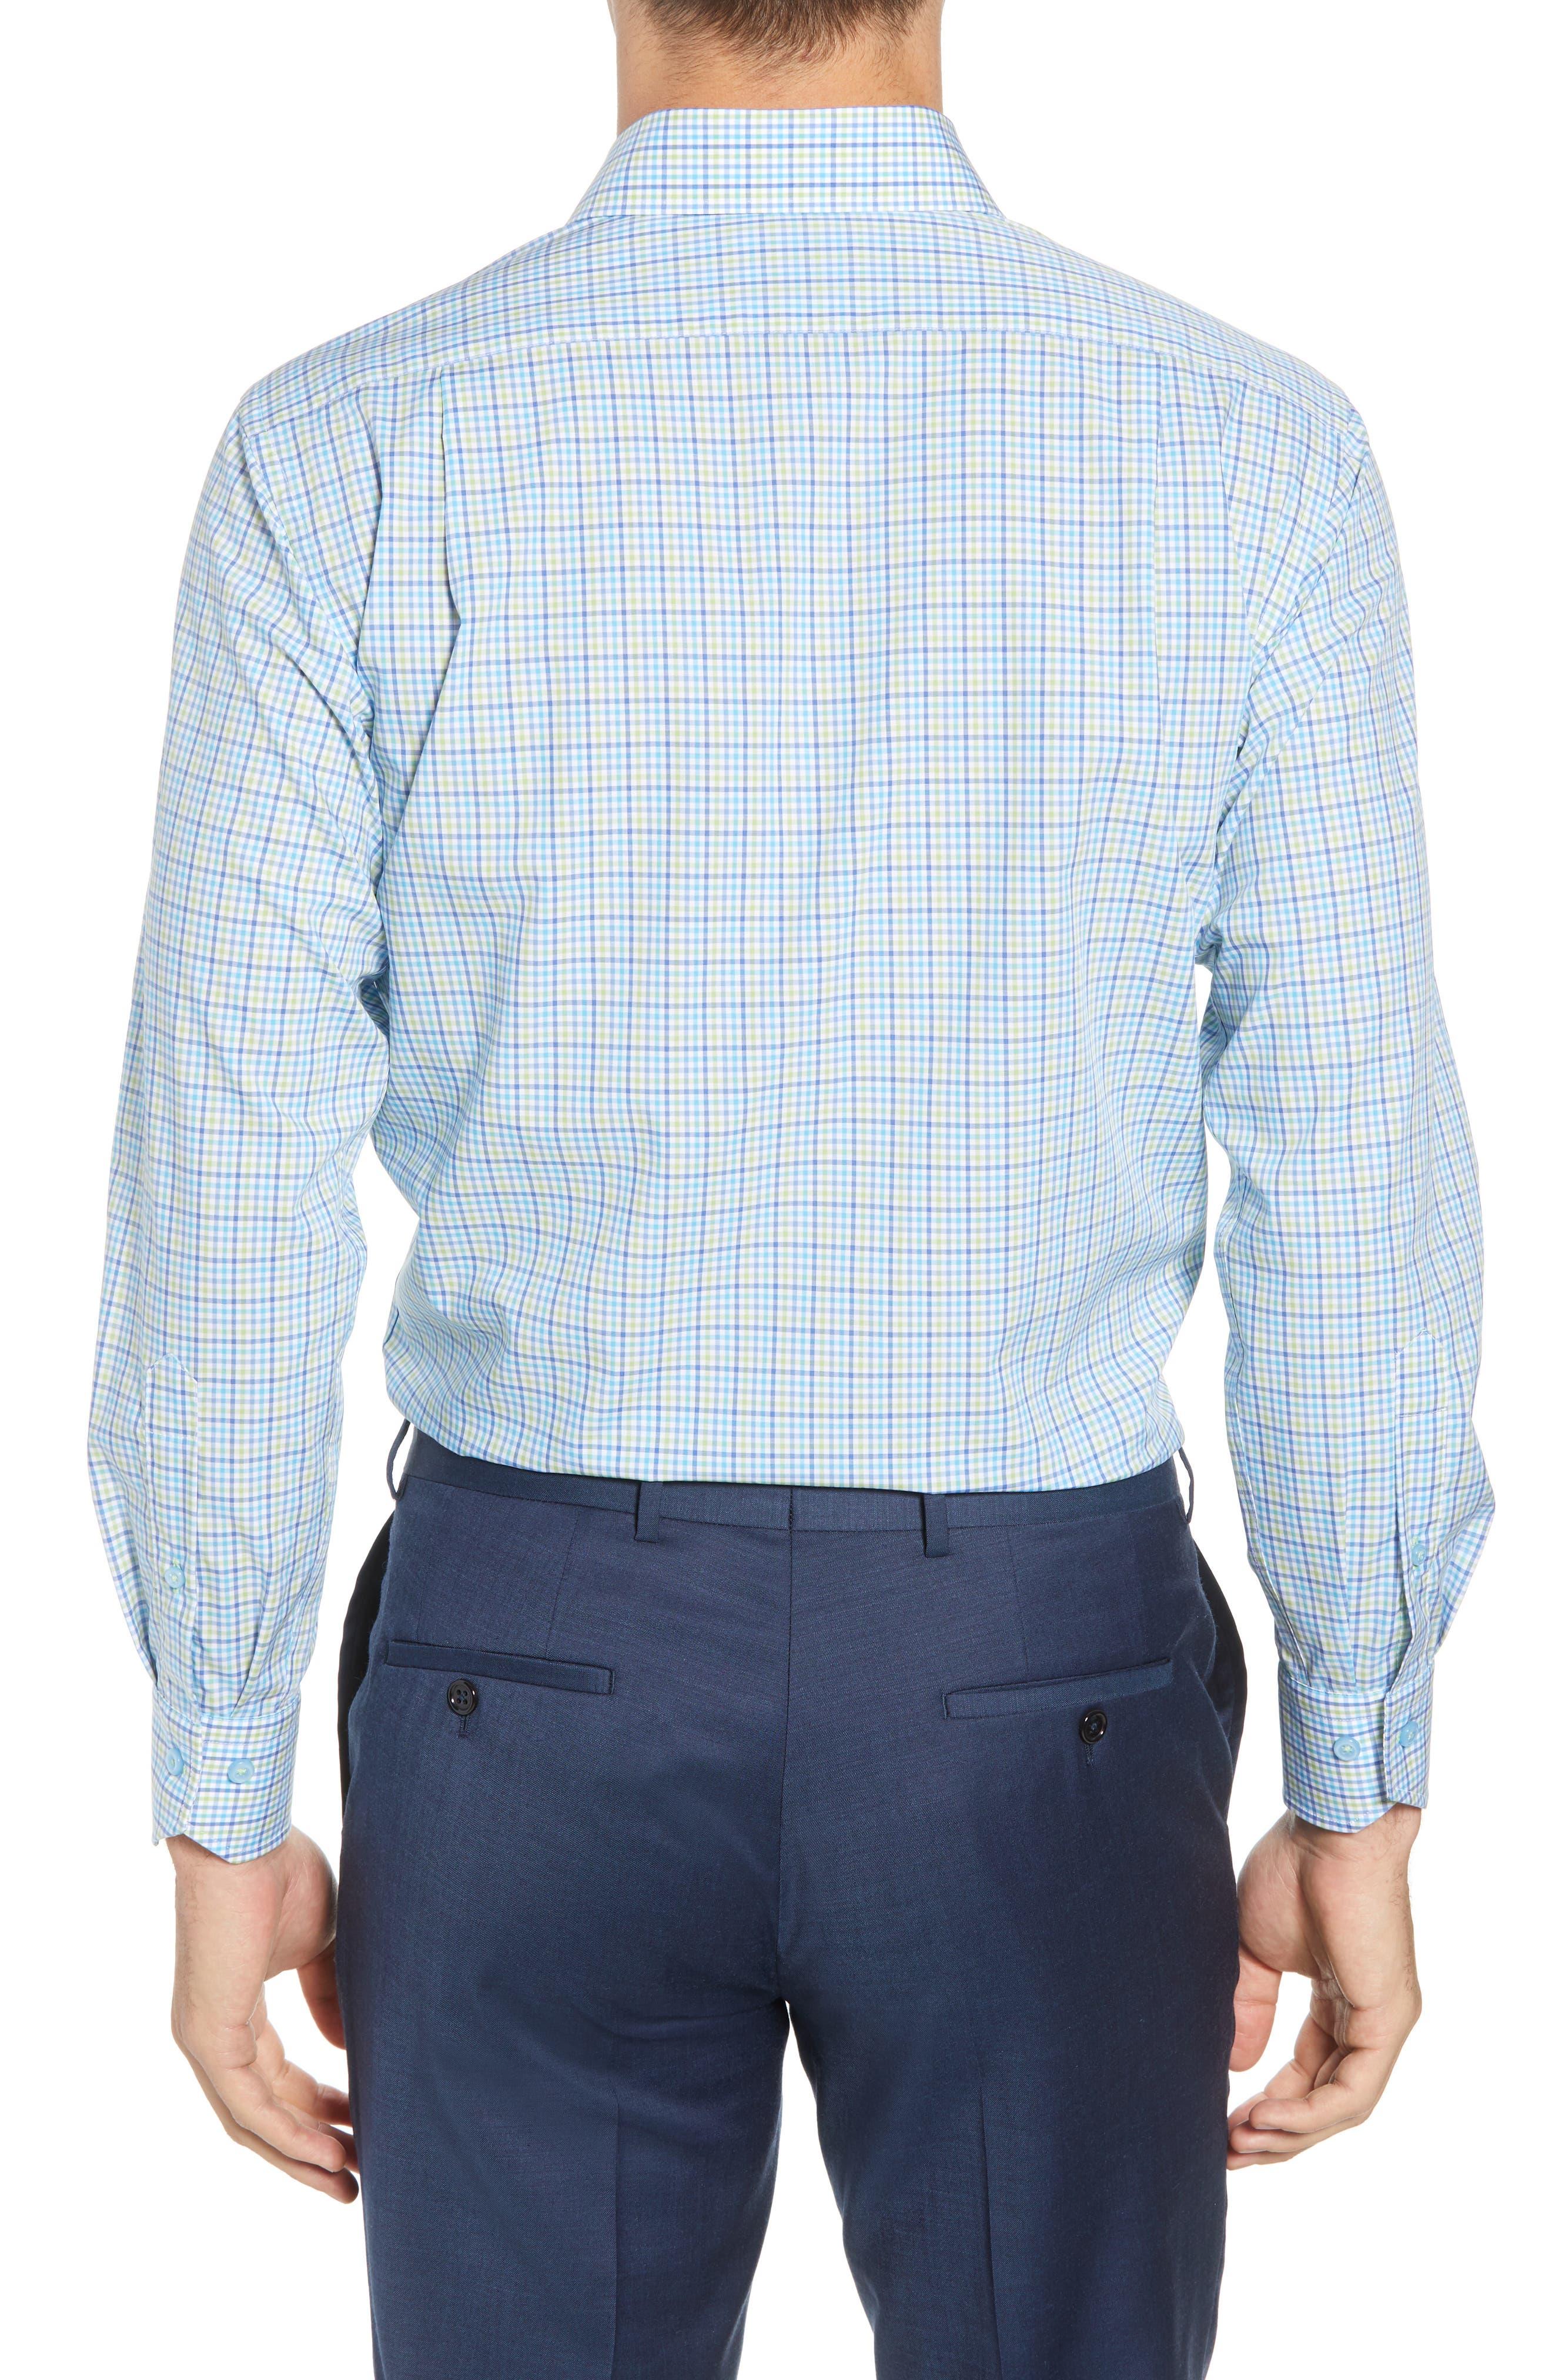 Trim Fit Check Dress Shirt,                             Alternate thumbnail 3, color,                             Blue/ Green